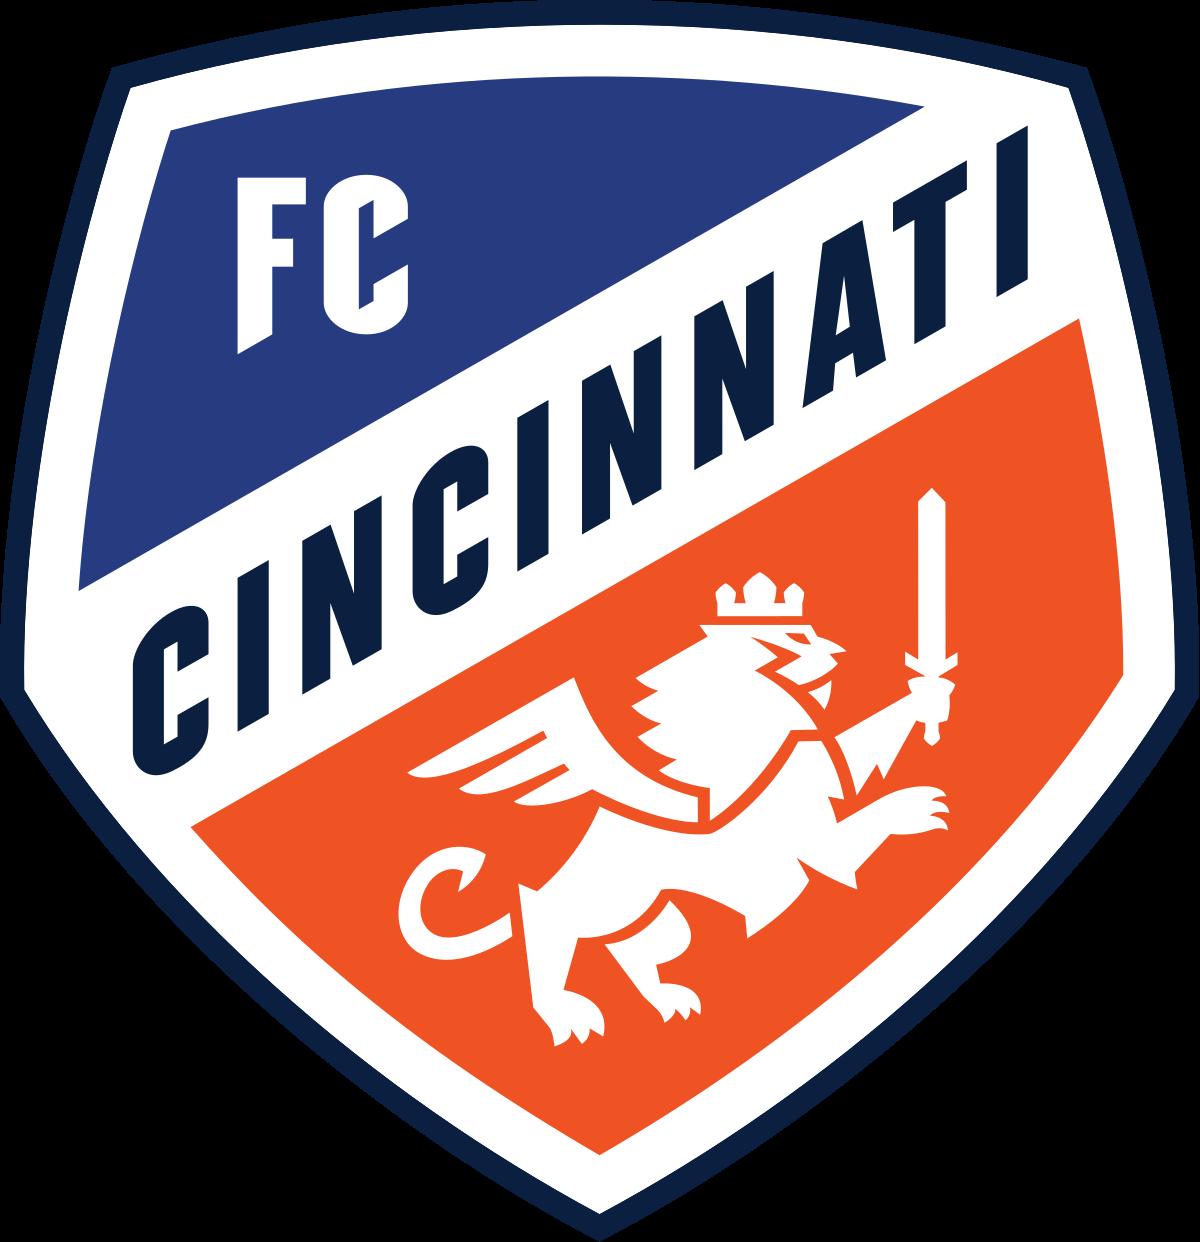 Minnesota United vs Cincinnati awayteam logo